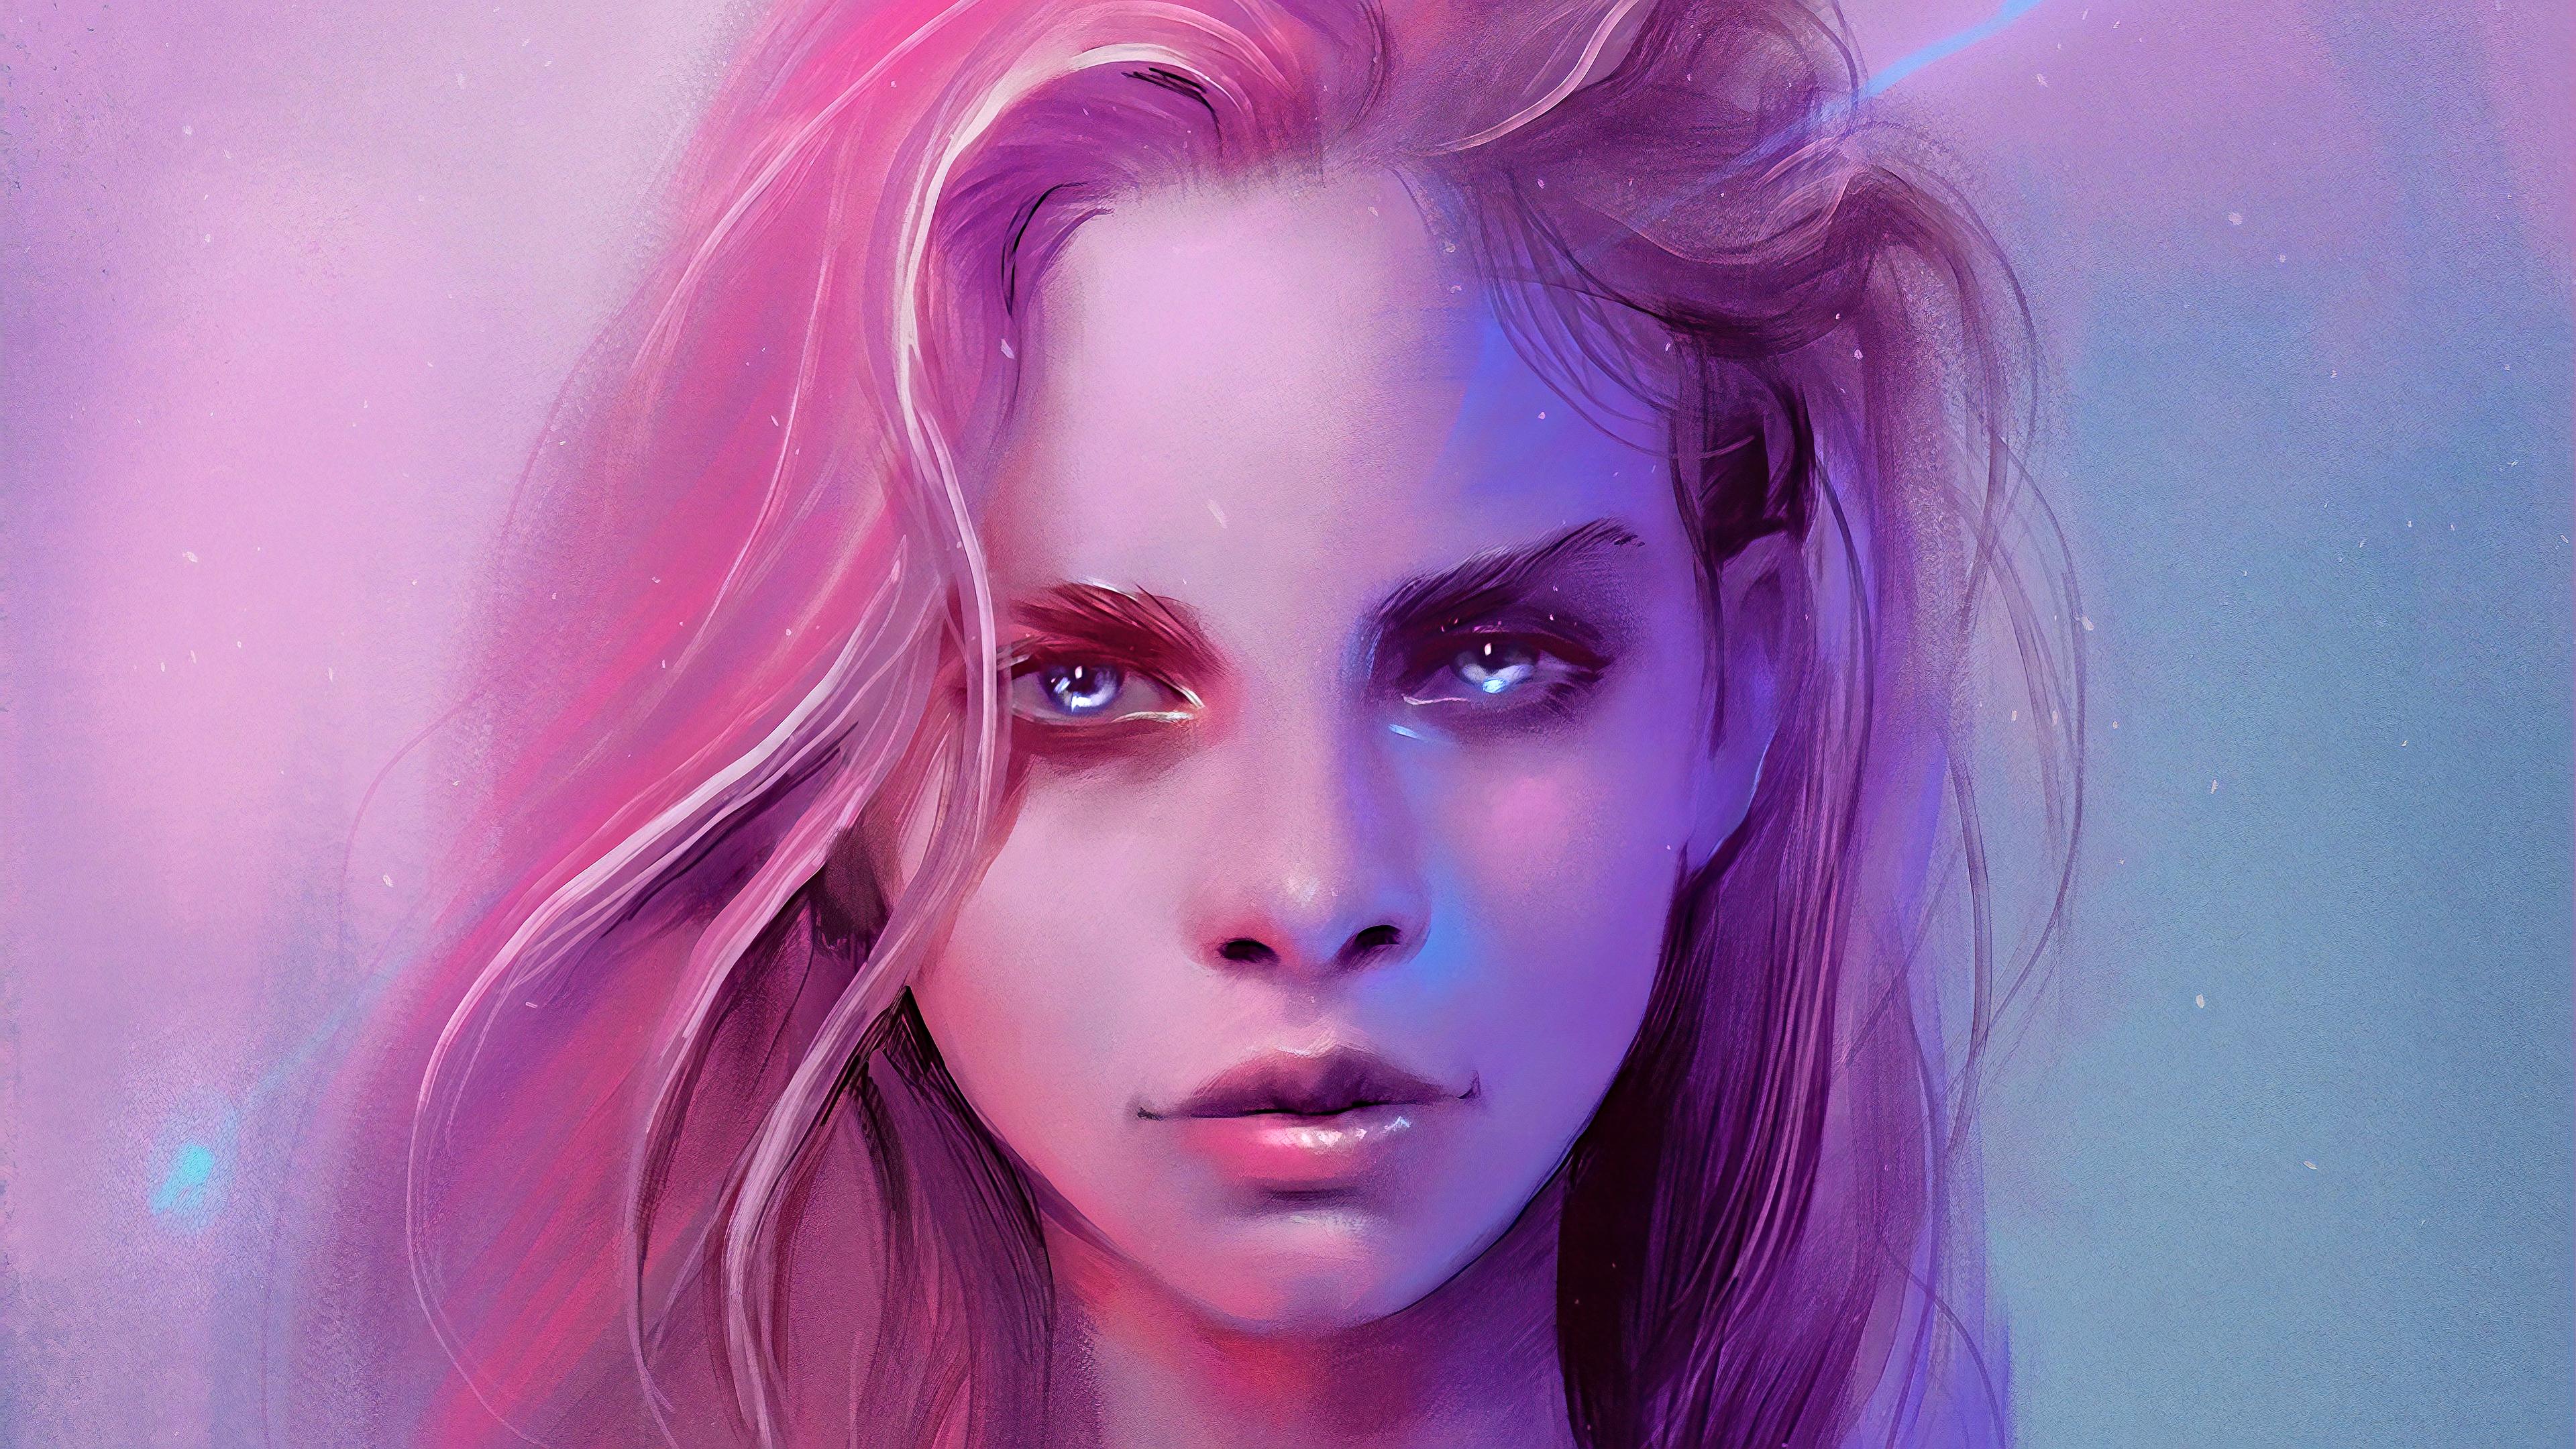 General 3840x2160 digital art concept art artwork fantasy art fan art face cyber portrait women fantasy girl pink